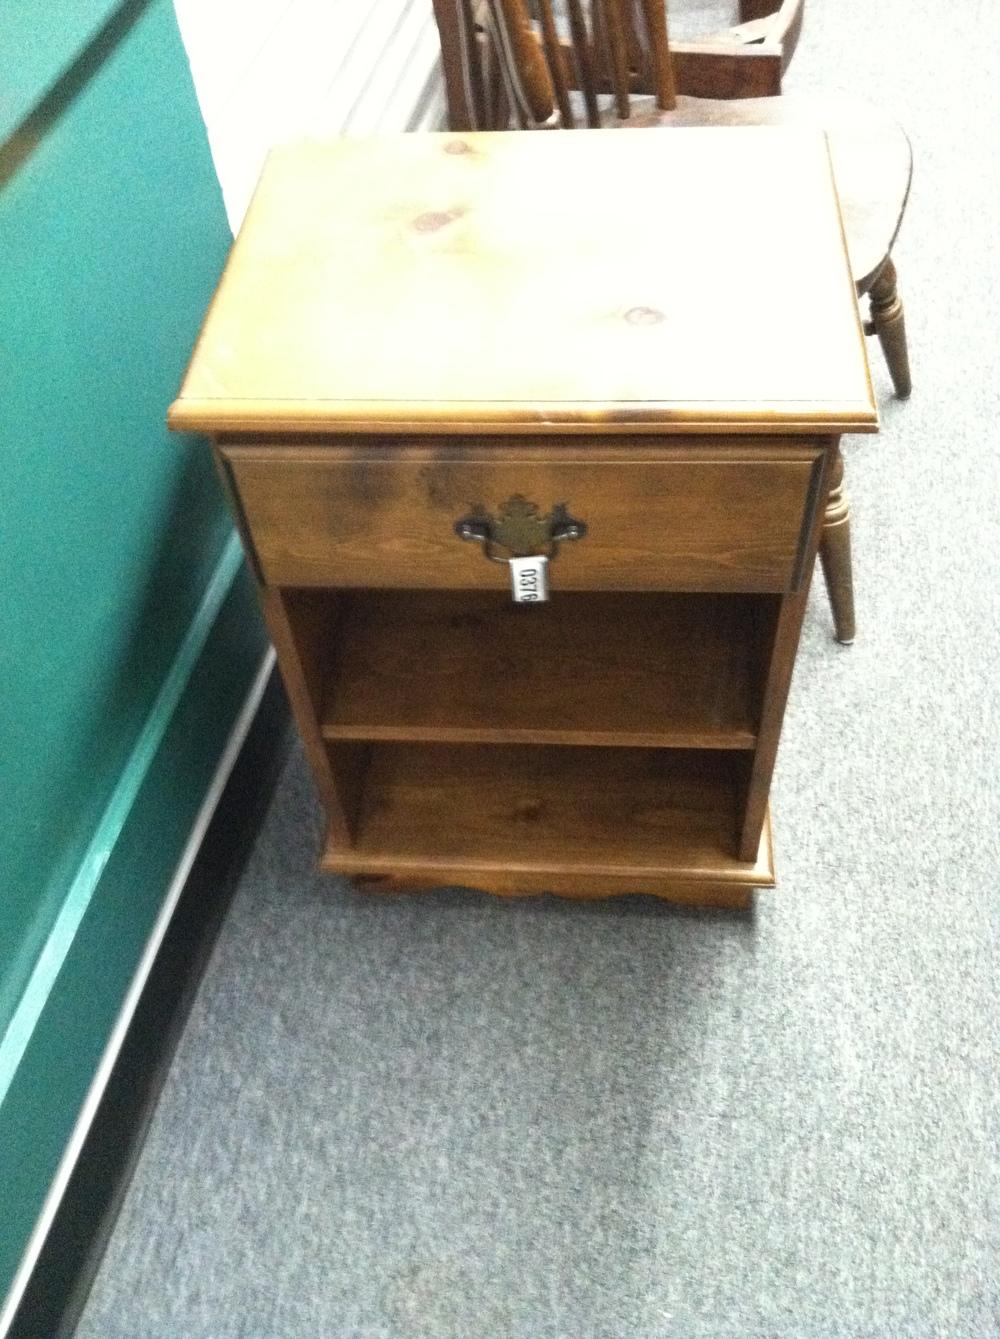 0376: Small Wood Shelf / Bedside Table